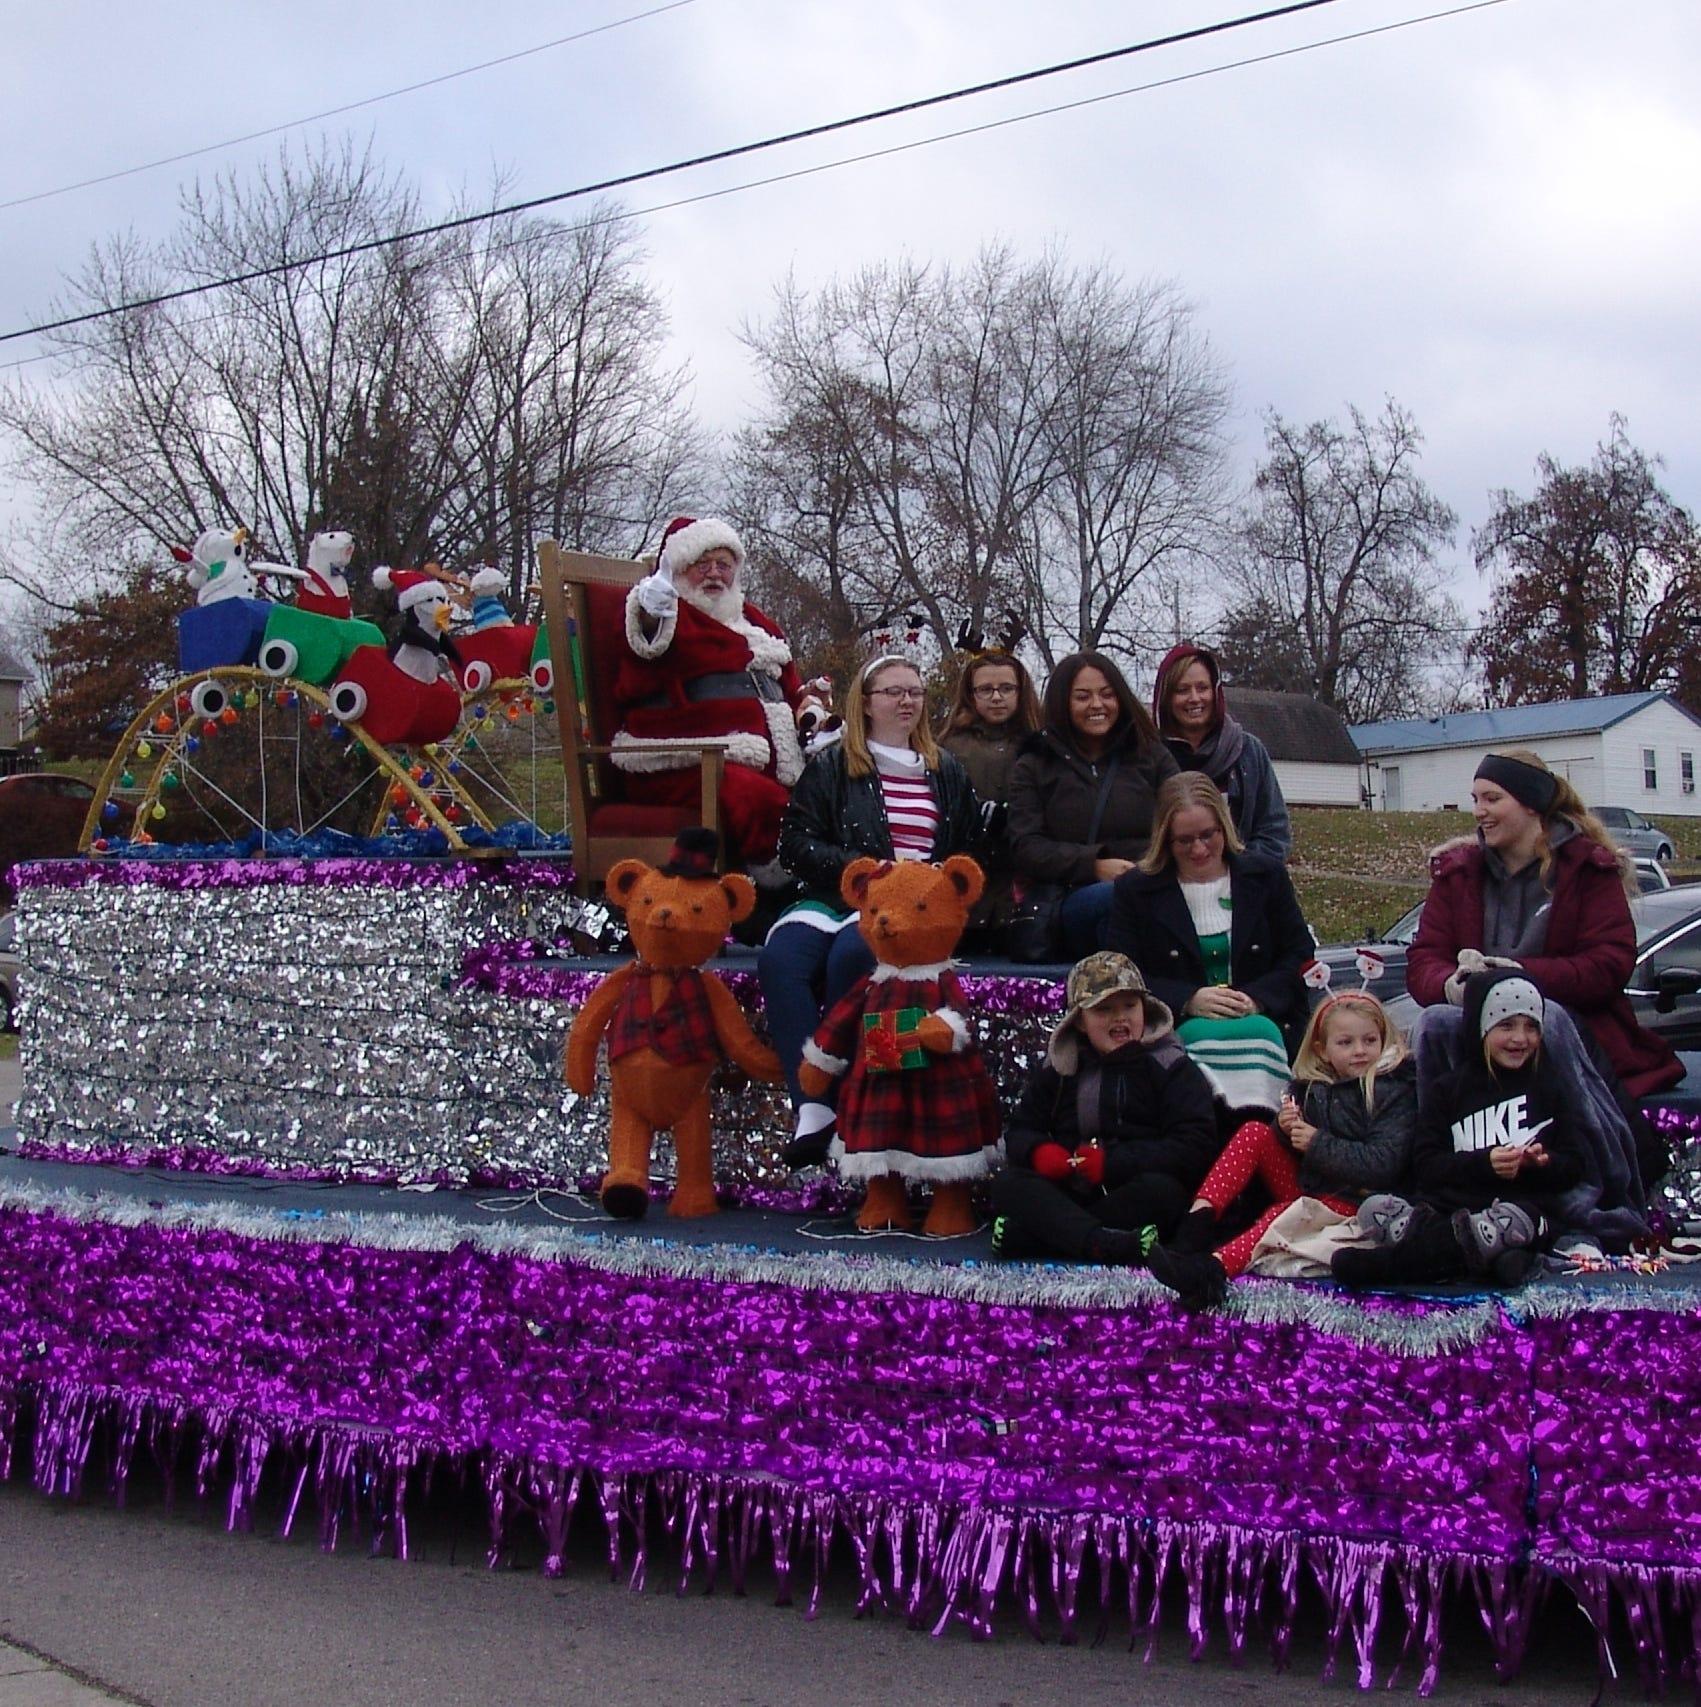 Storybook Christmas Tree Festival 2020 Storybook Christmas Parade